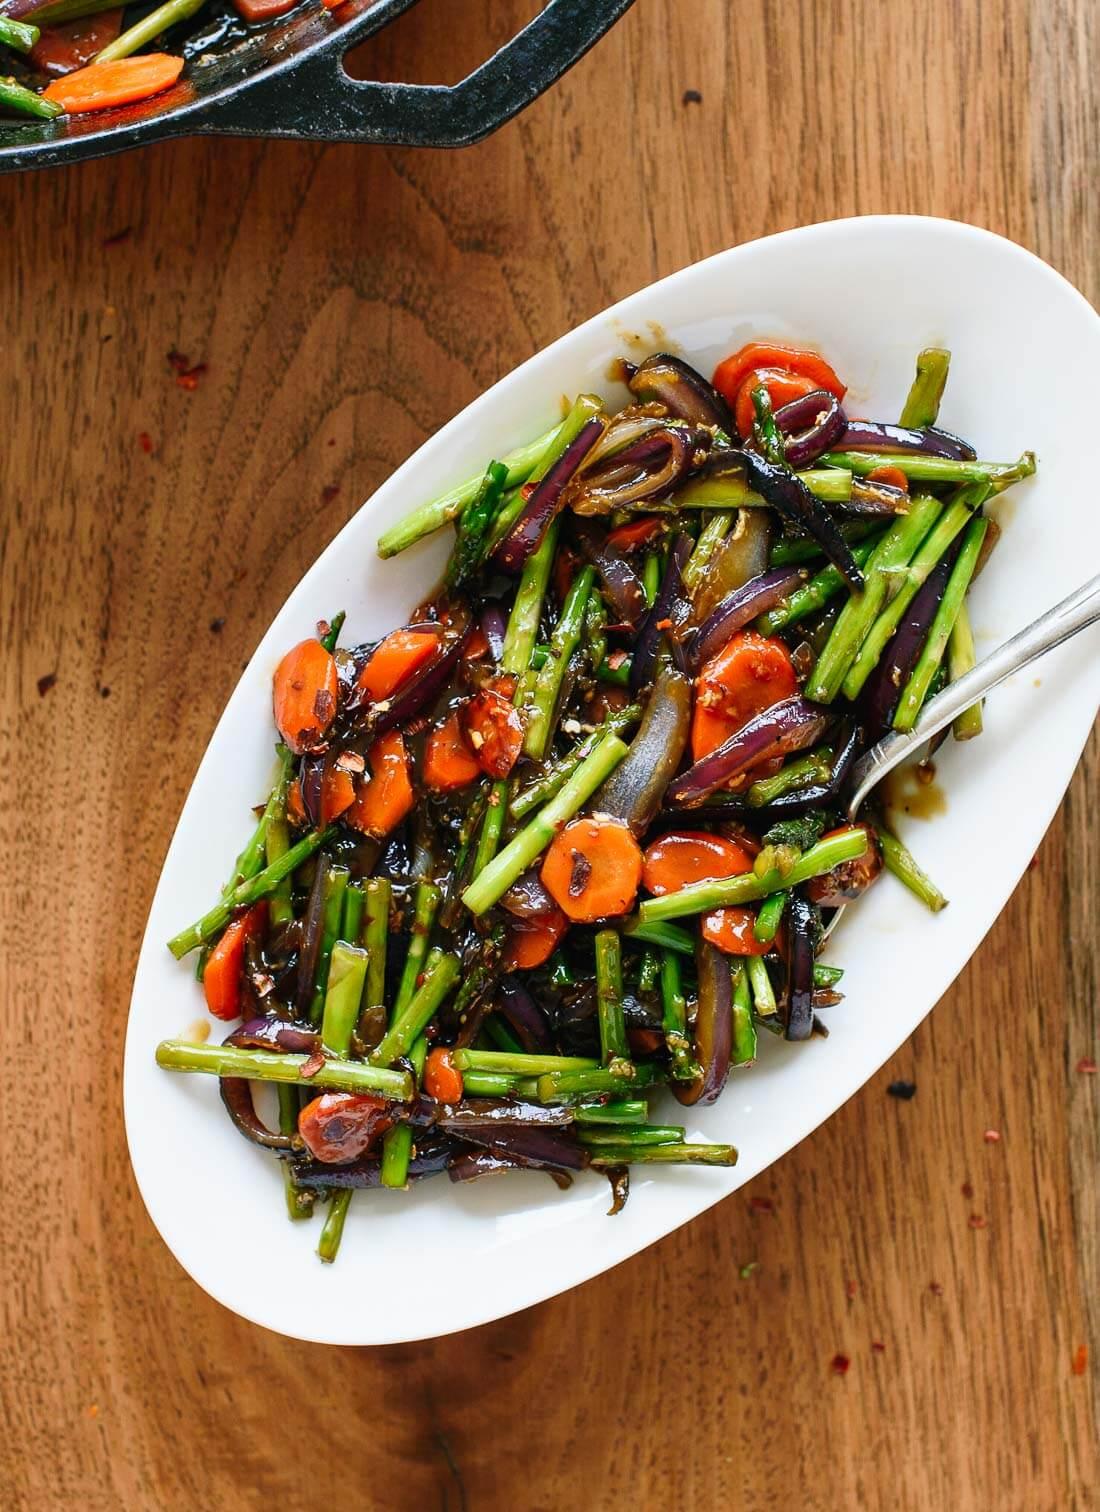 Easy veg stir fry recipes